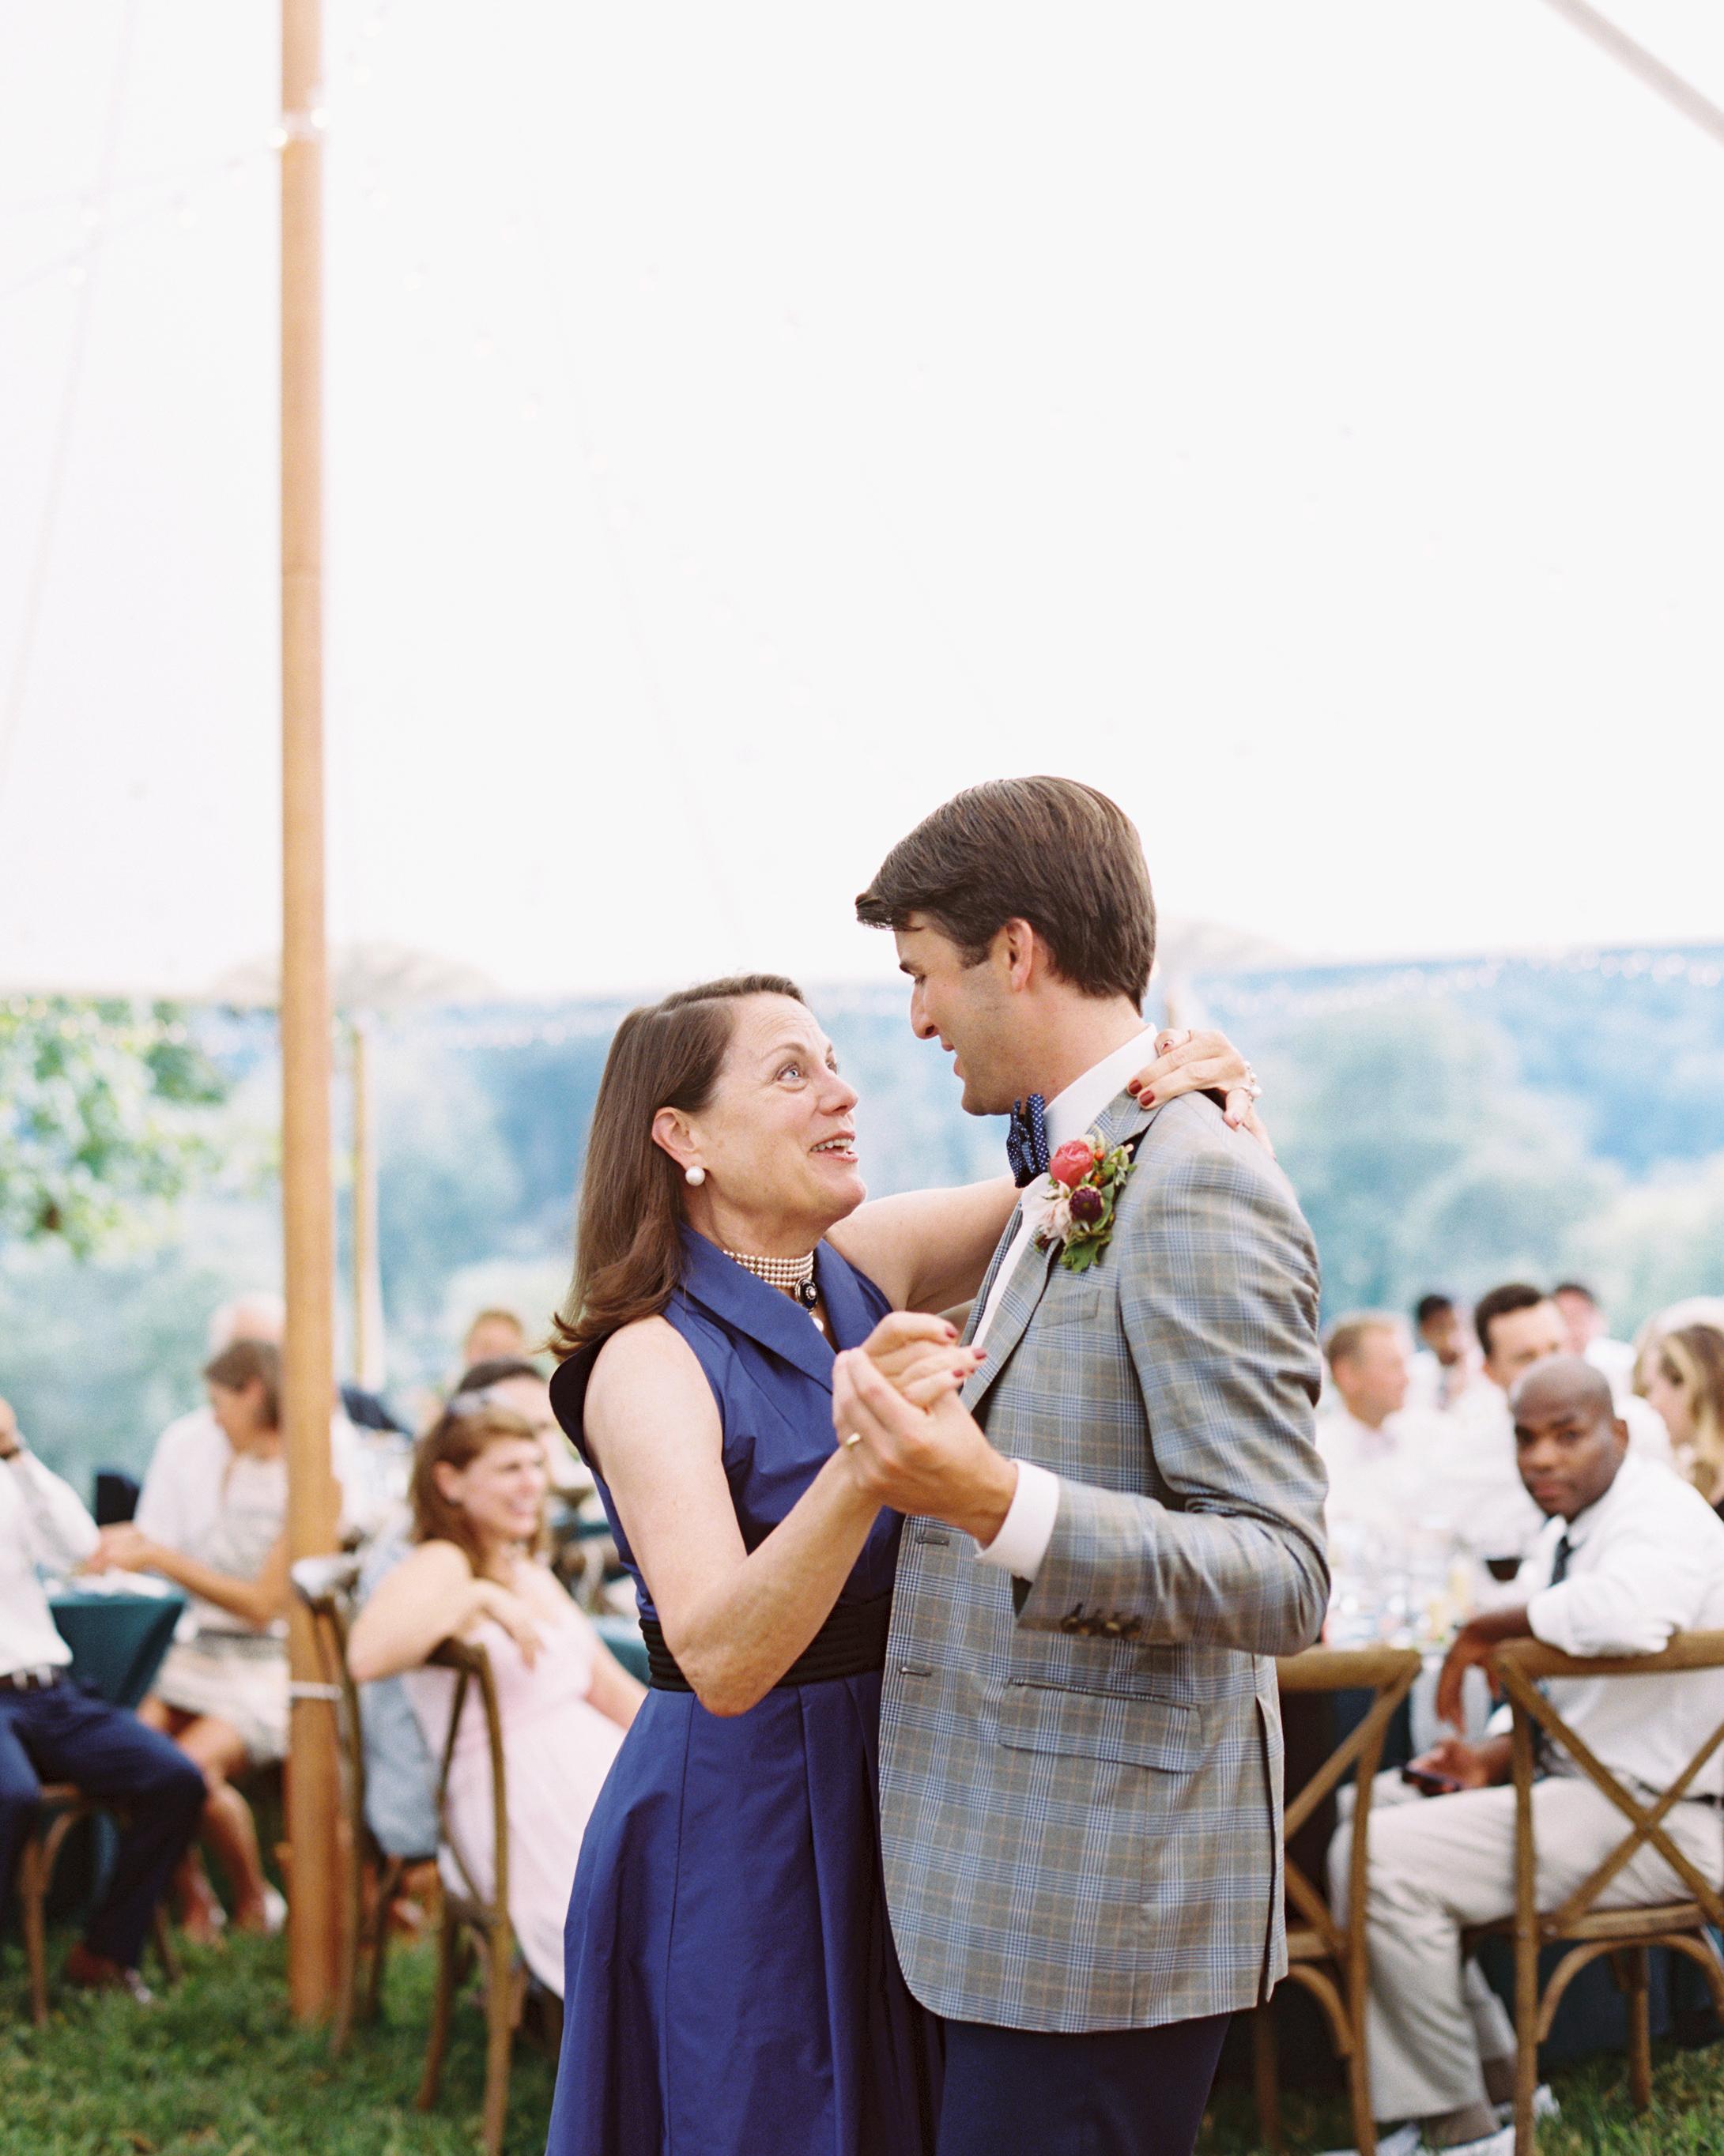 michelle-john-wedding-north-carolina-14-s111840-0215.jpg